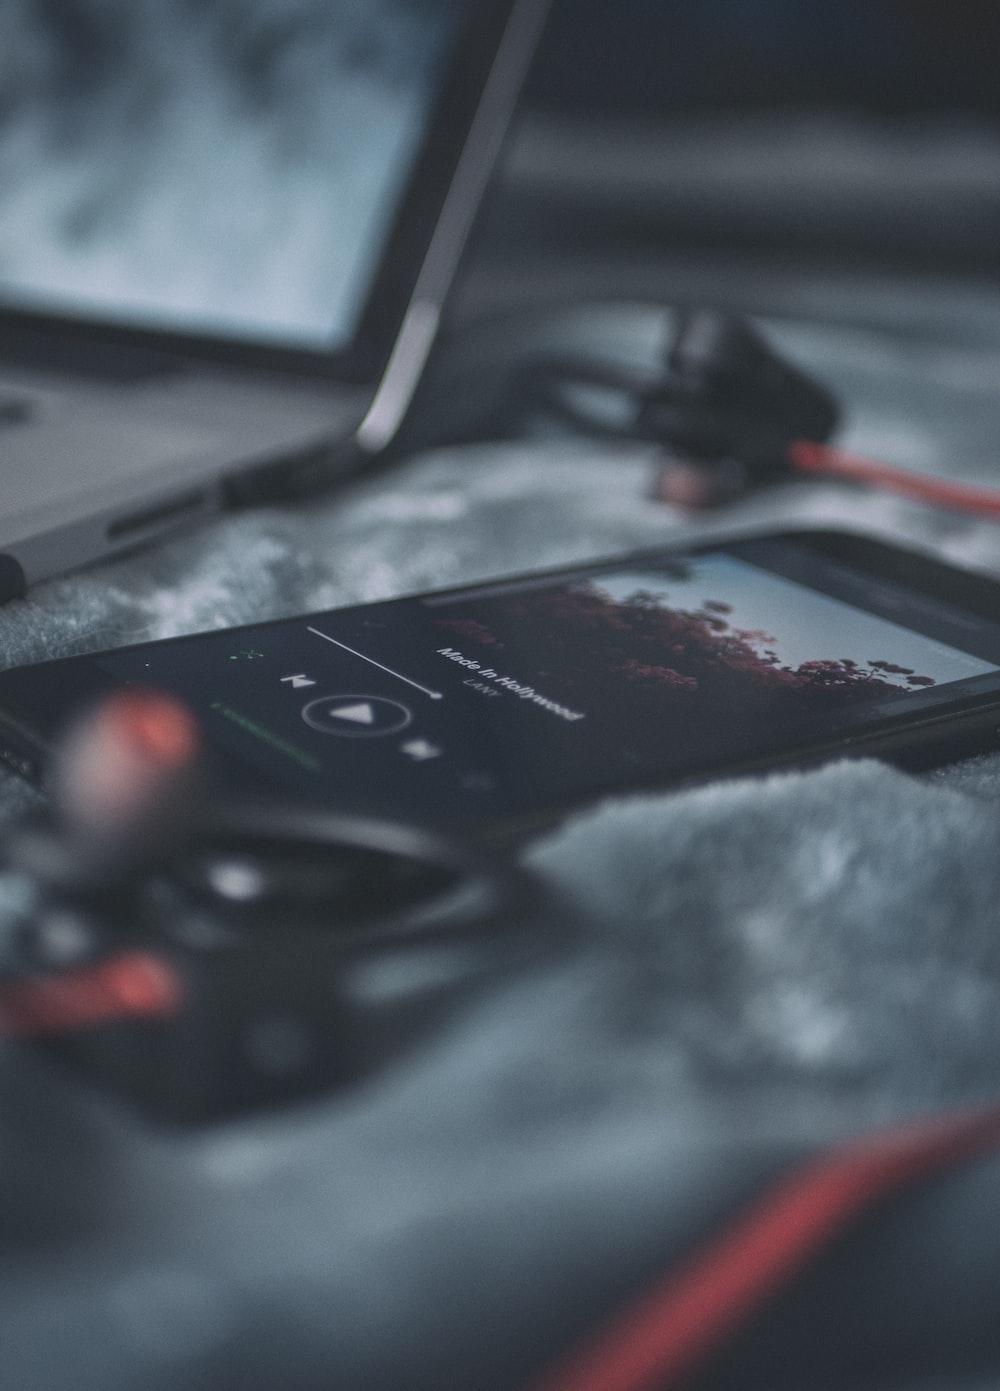 black smartphone on gray textile